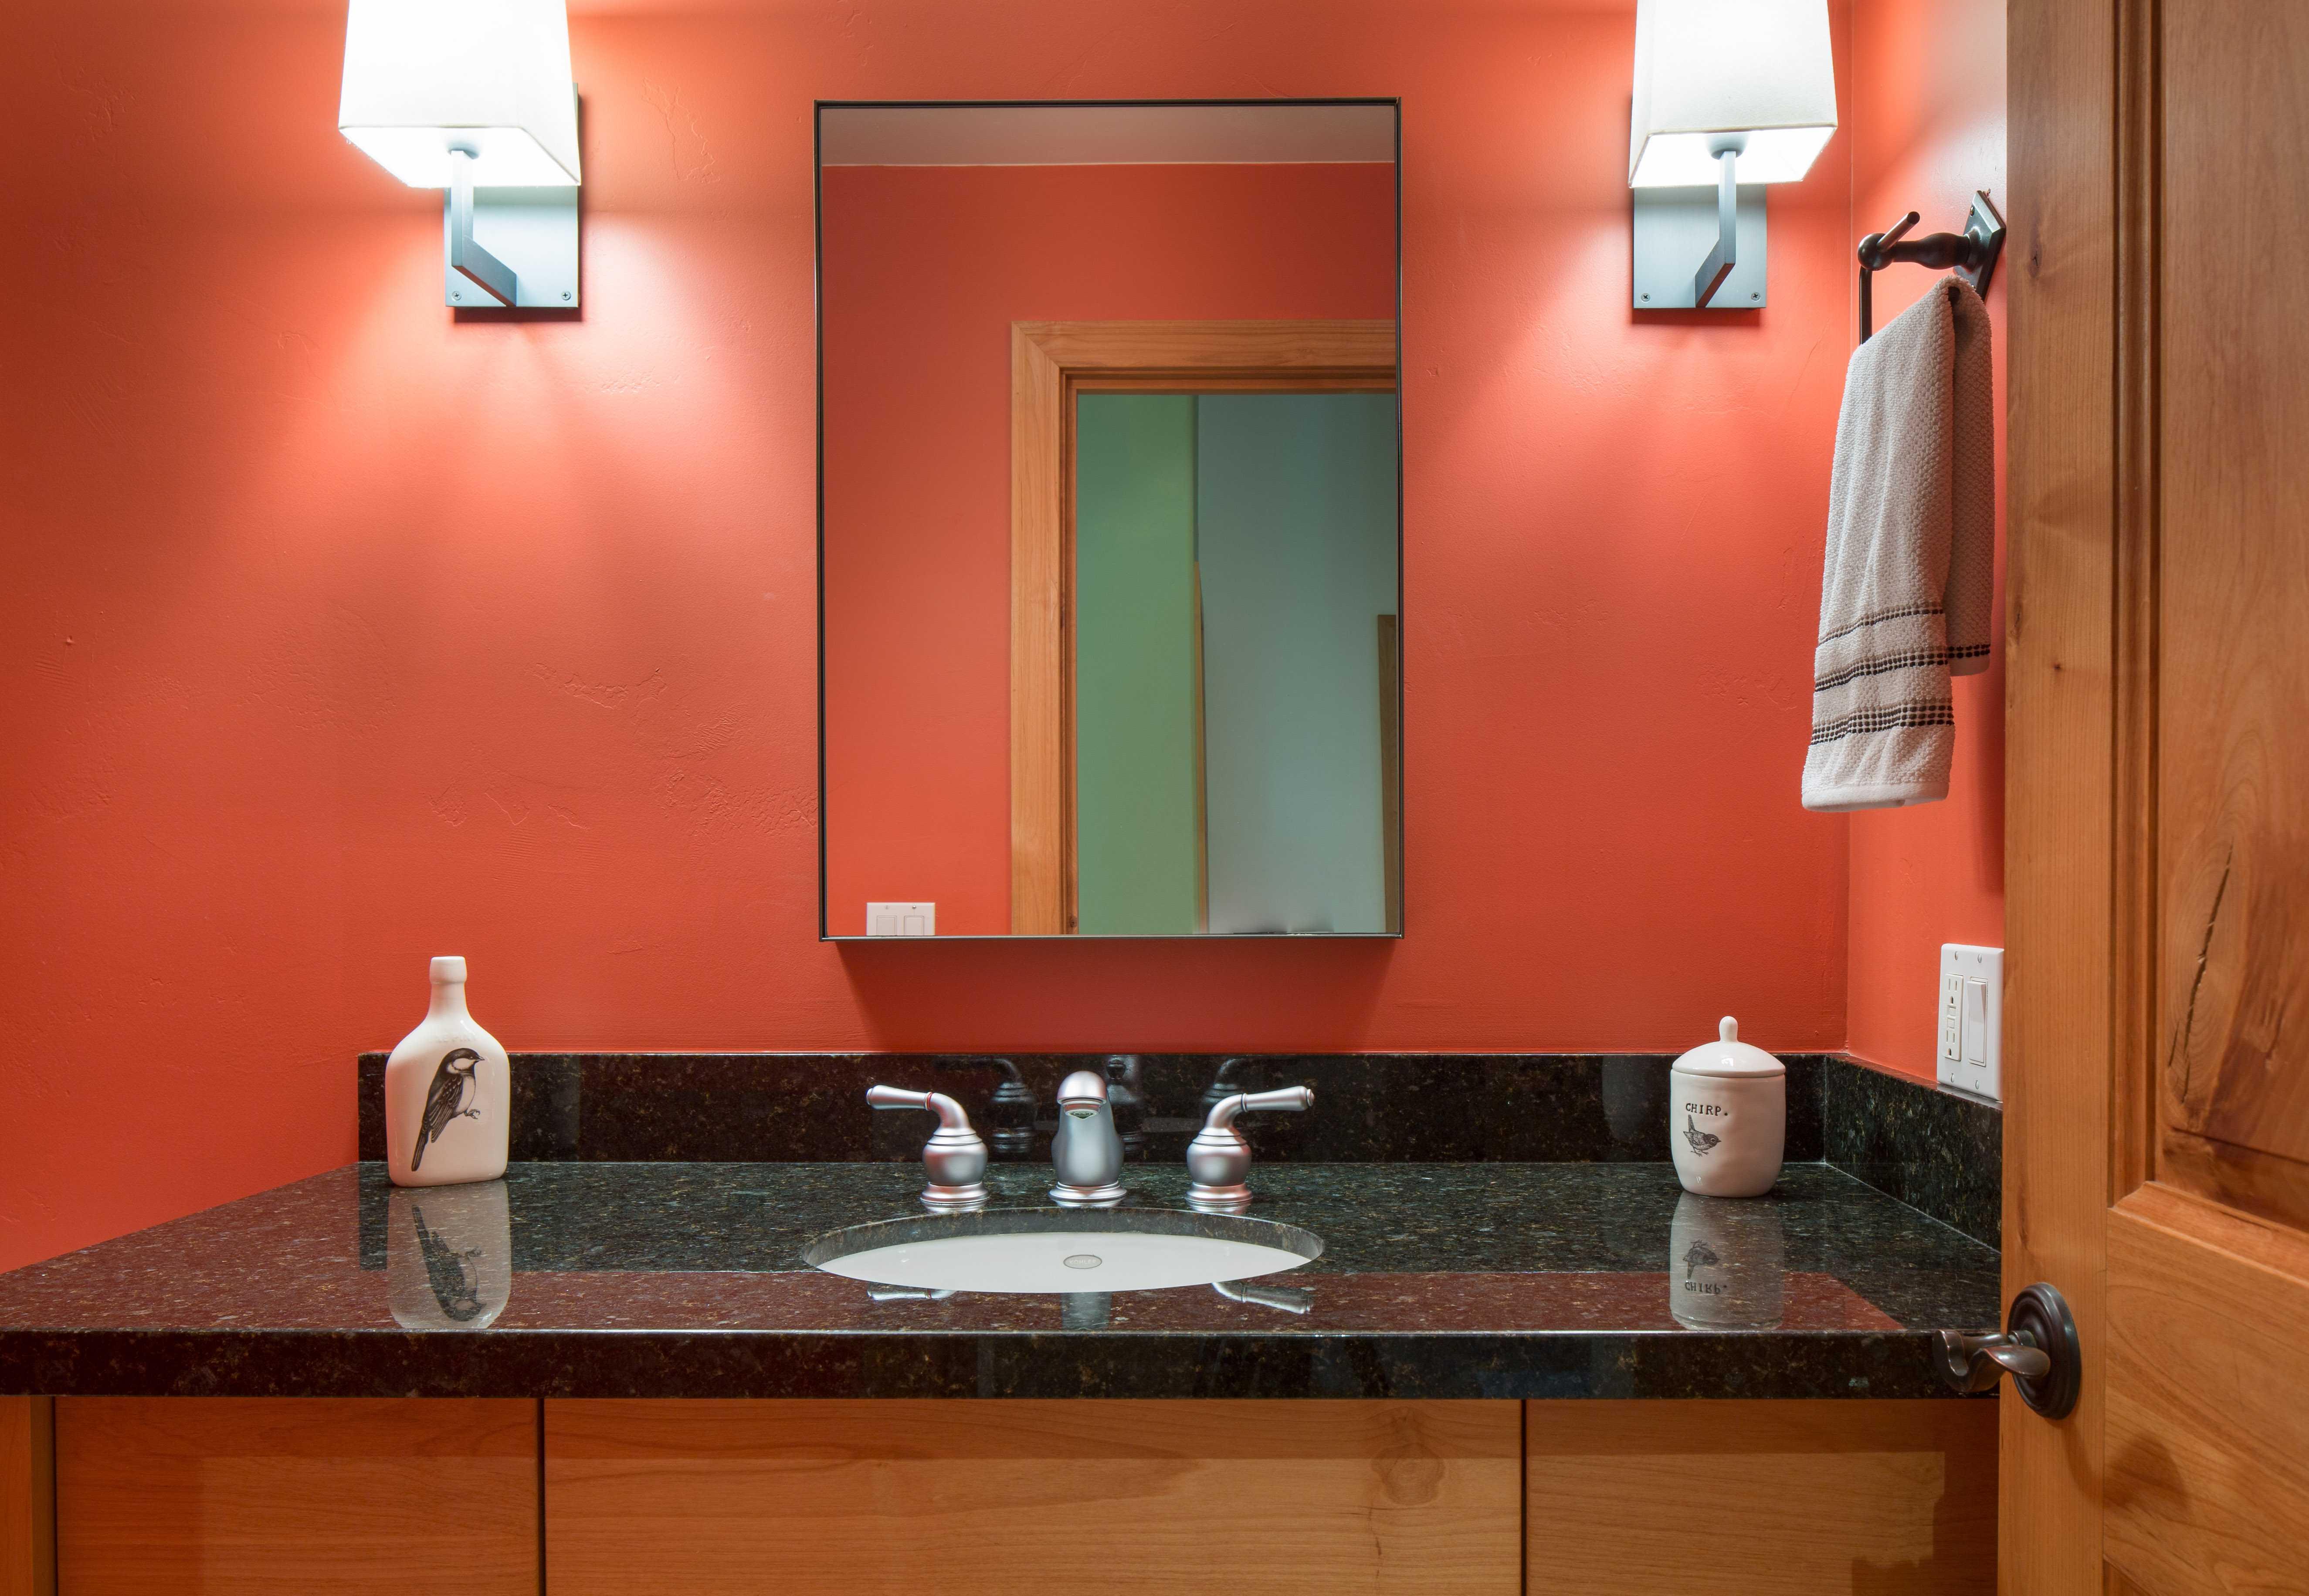 Additional photo for property listing at Luxury Living 119 Dollar Drive Ketchum, Idaho 83340 États-Unis